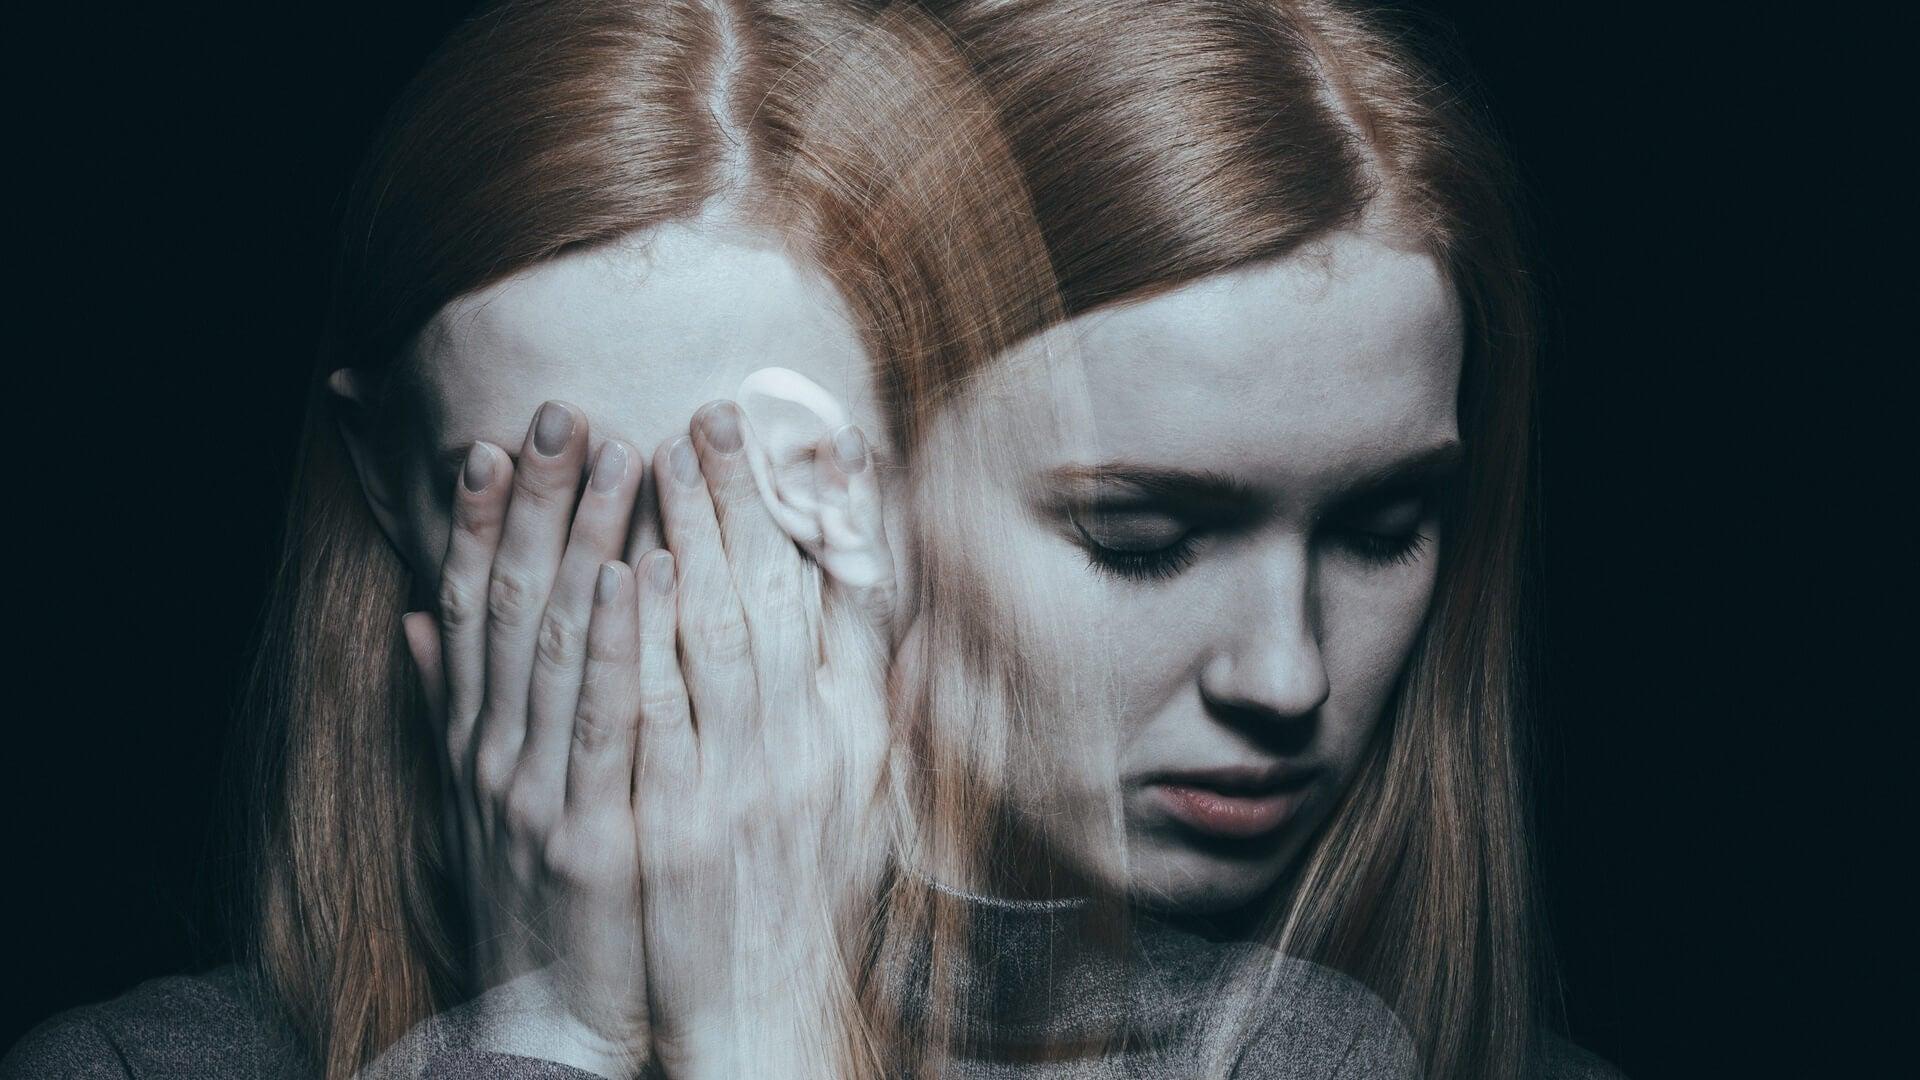 Mujer con trastorno psicotico breve